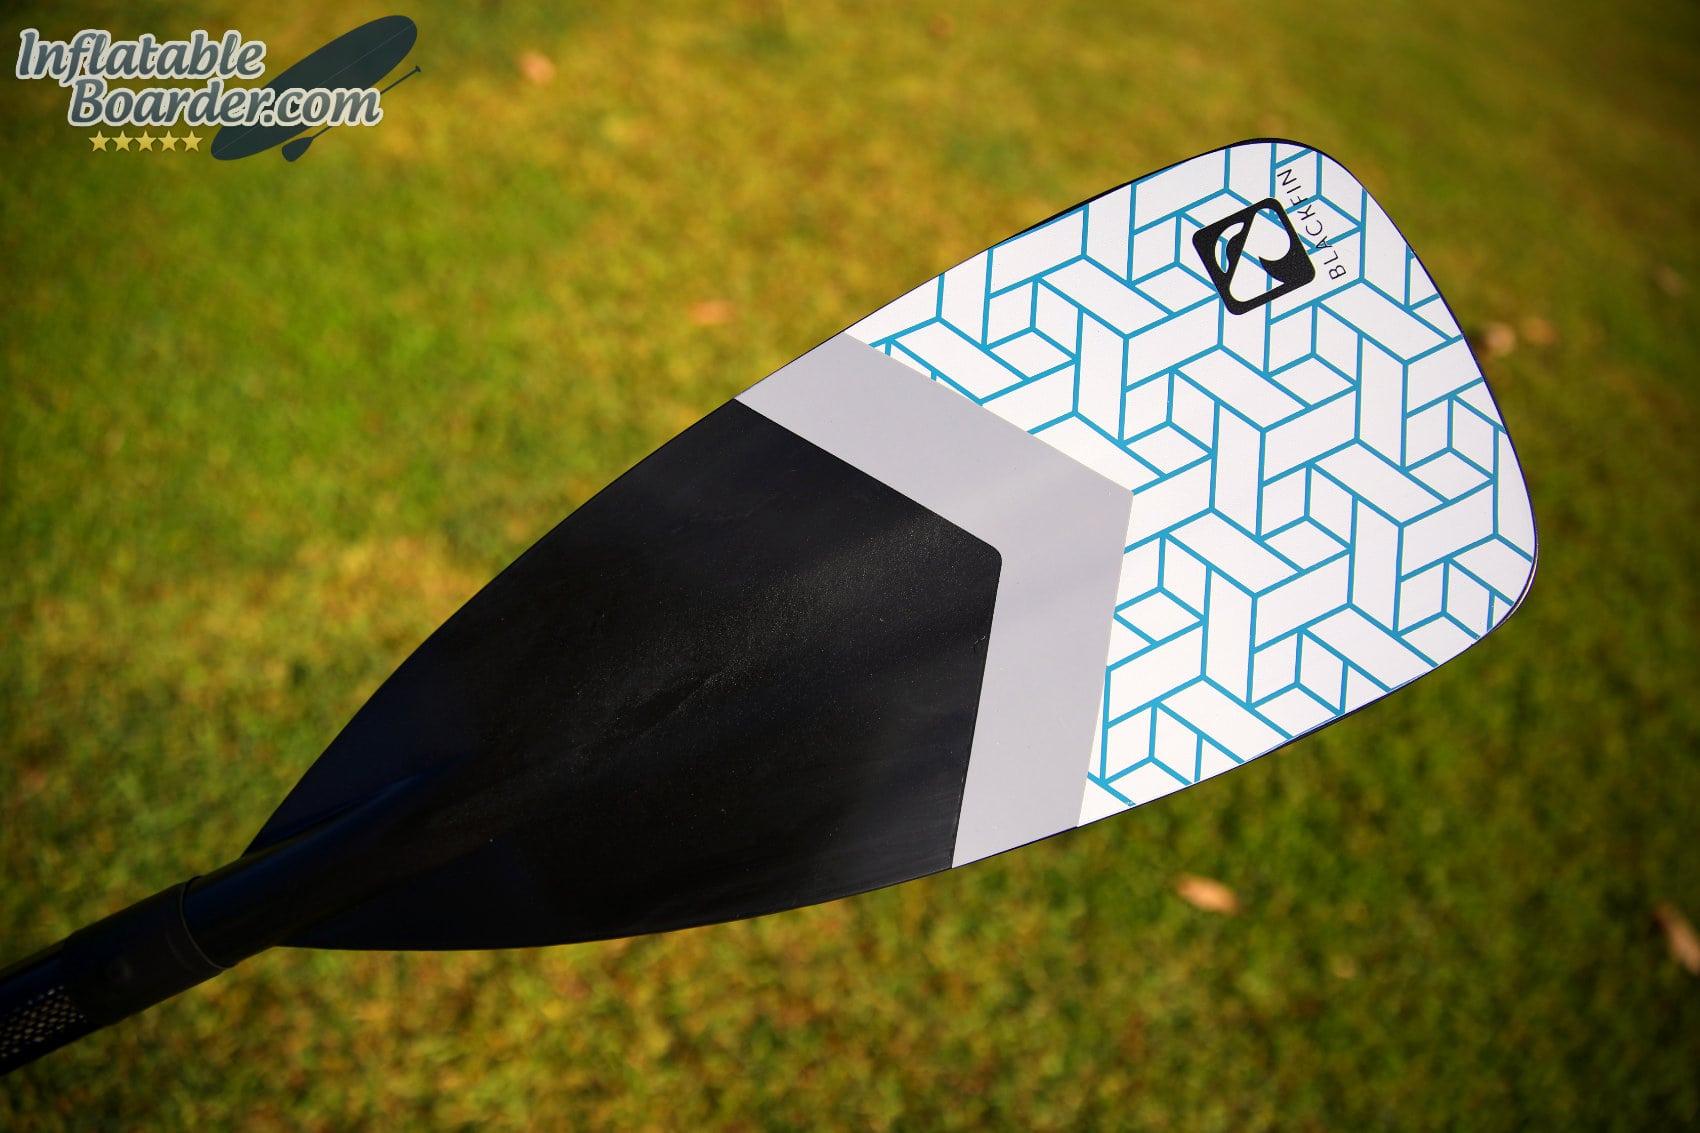 BLACKFIN SUP Paddle Blade